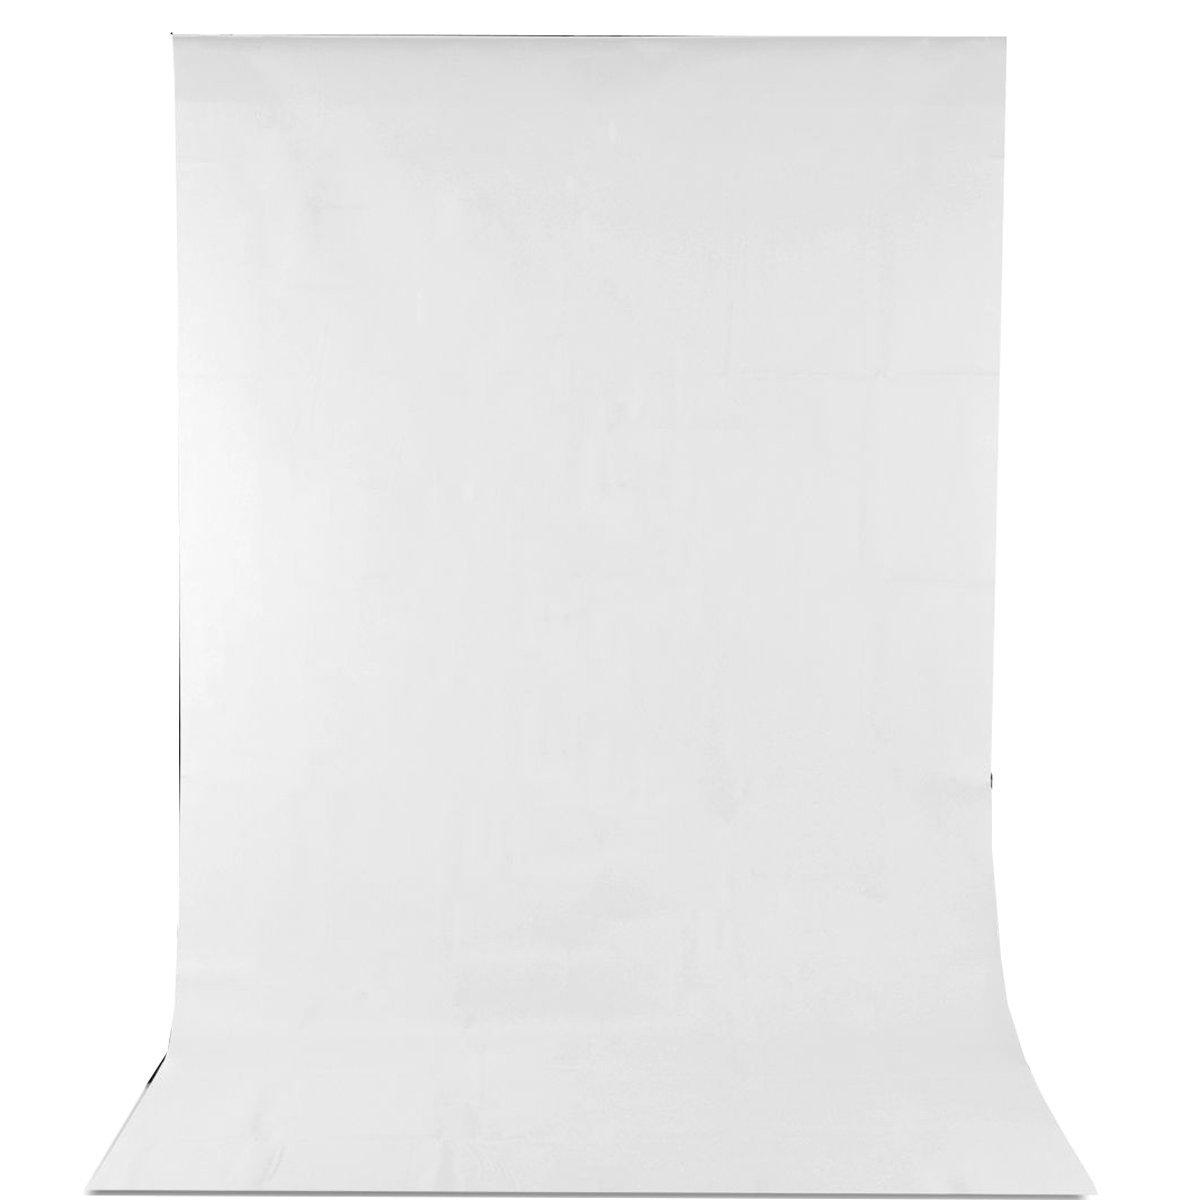 kit de iluminaci/ón para v/ídeos; para bodas y fiestas 1,6 x 3 m Tel/ón de fondo blanco para estudios de fotograf/ía verde o negro para t/écnico croma /¡